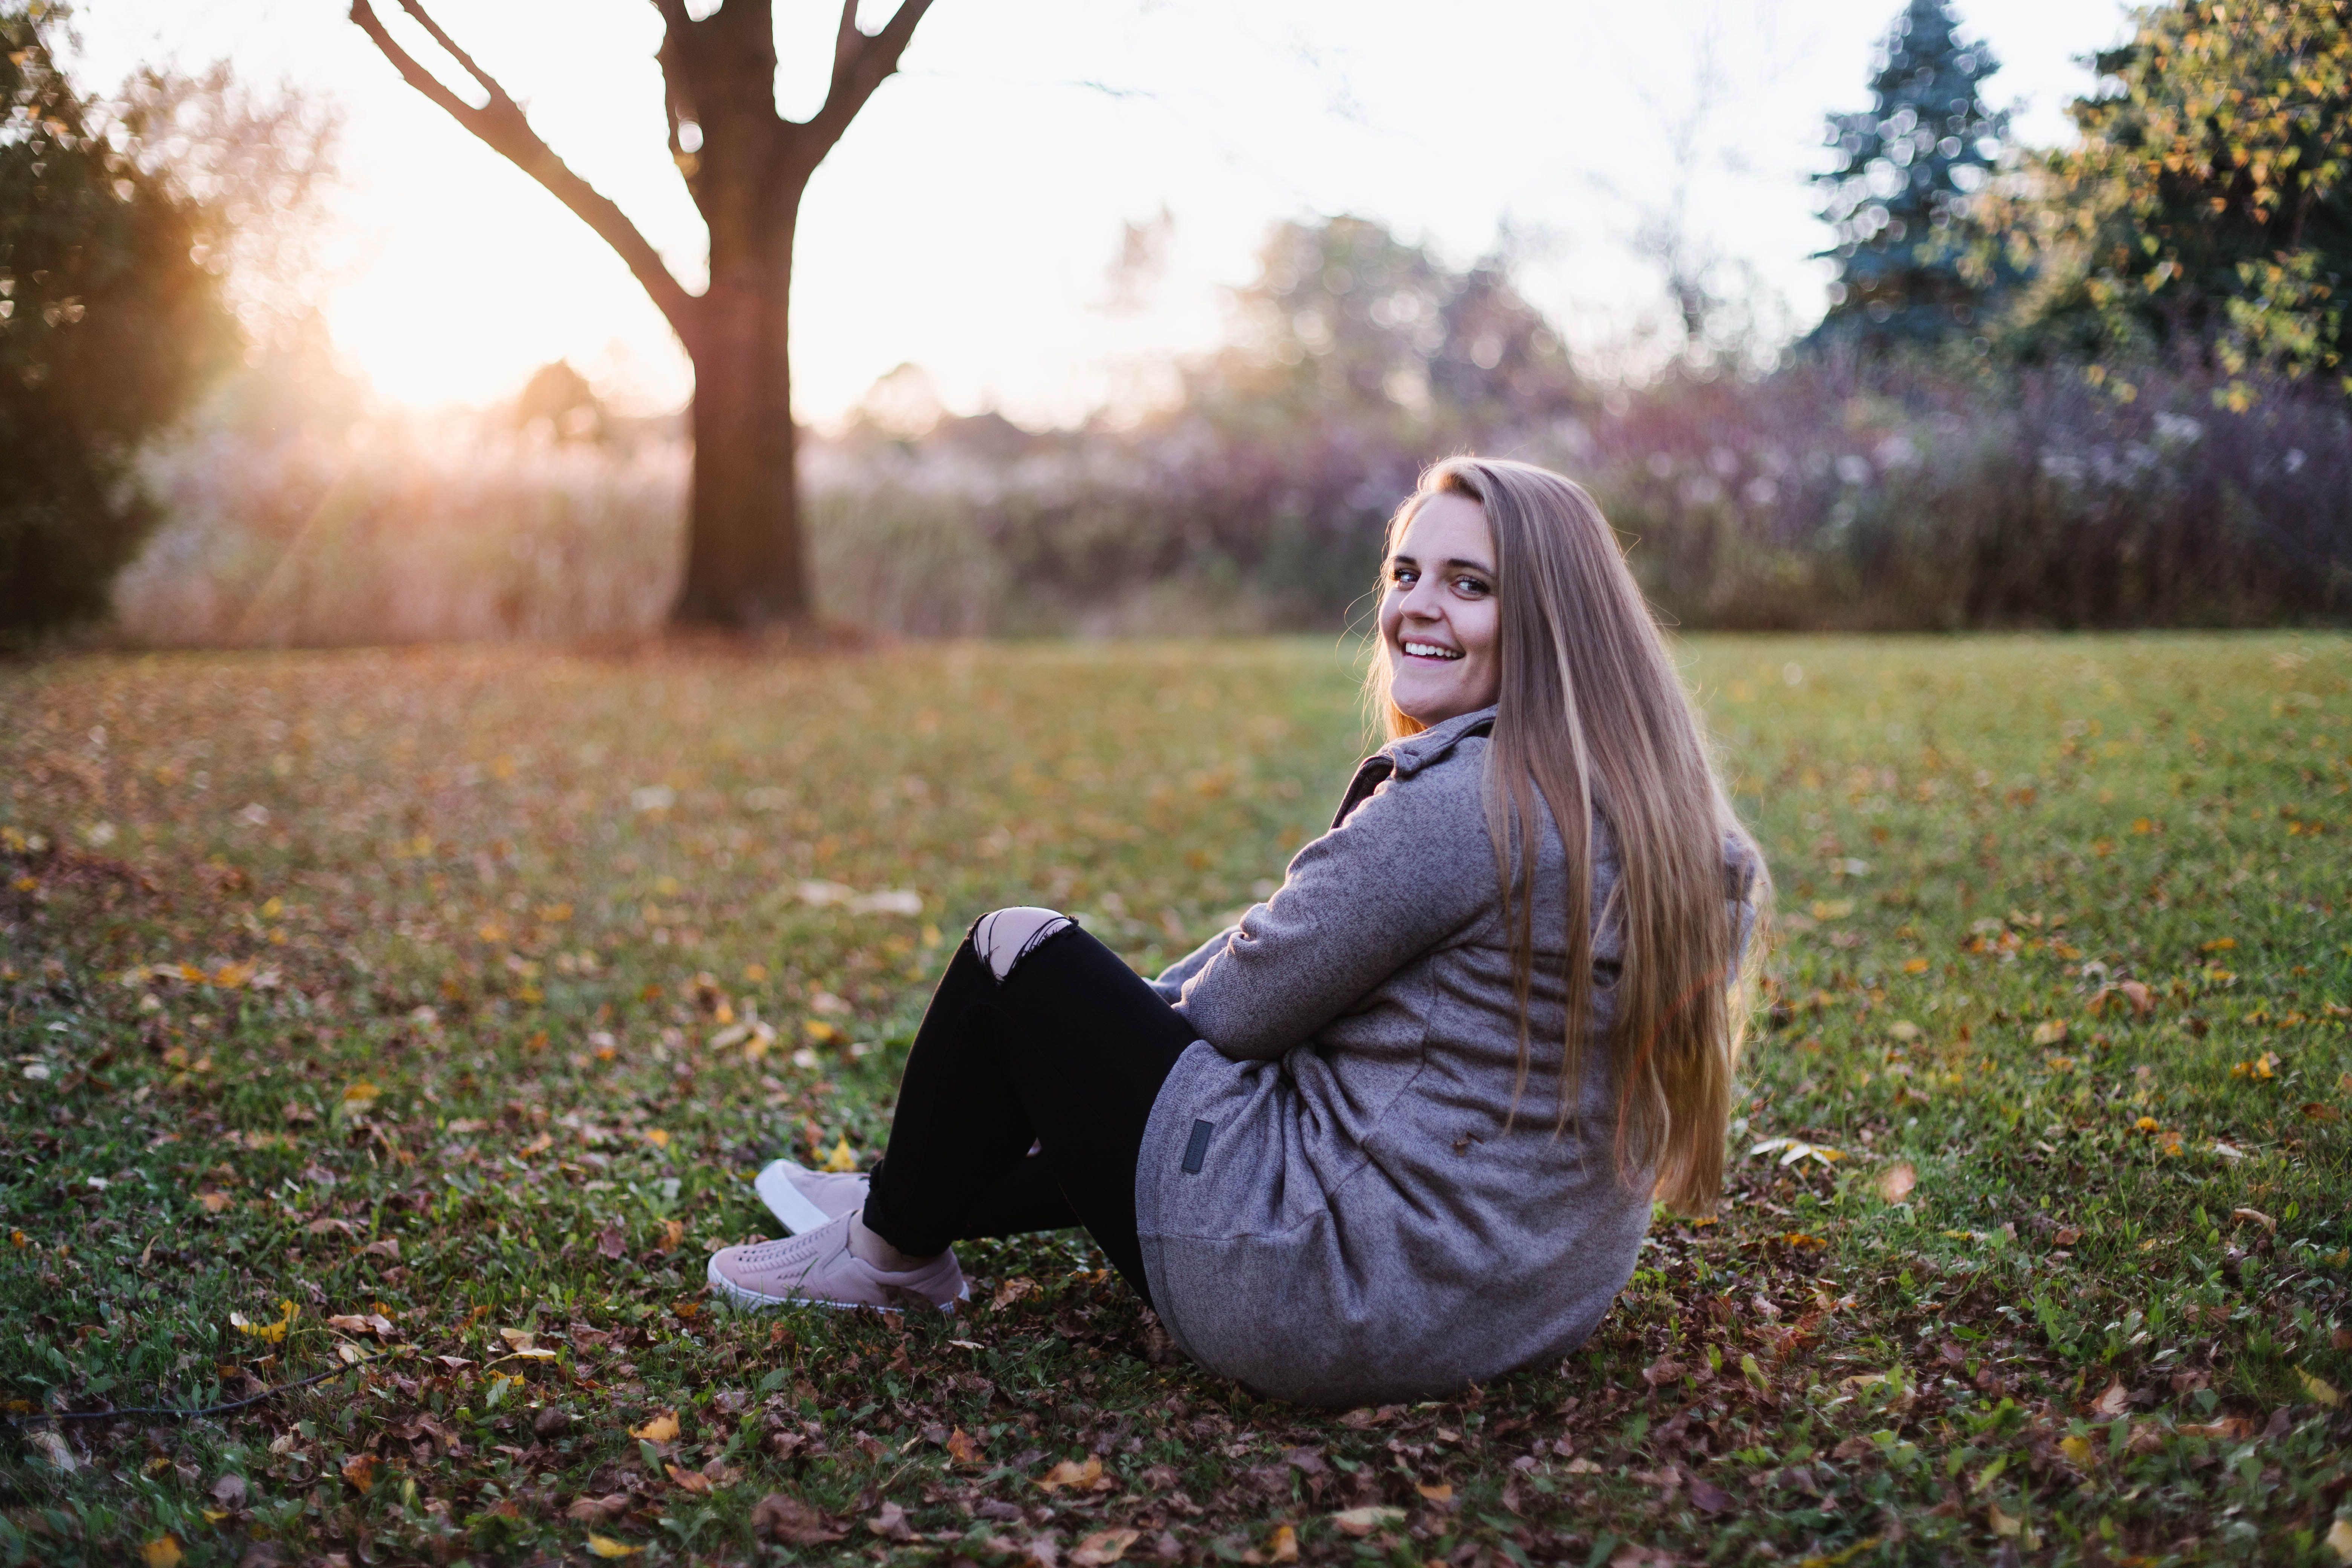 Senior portrait photographer in Appleton, Wisconsin